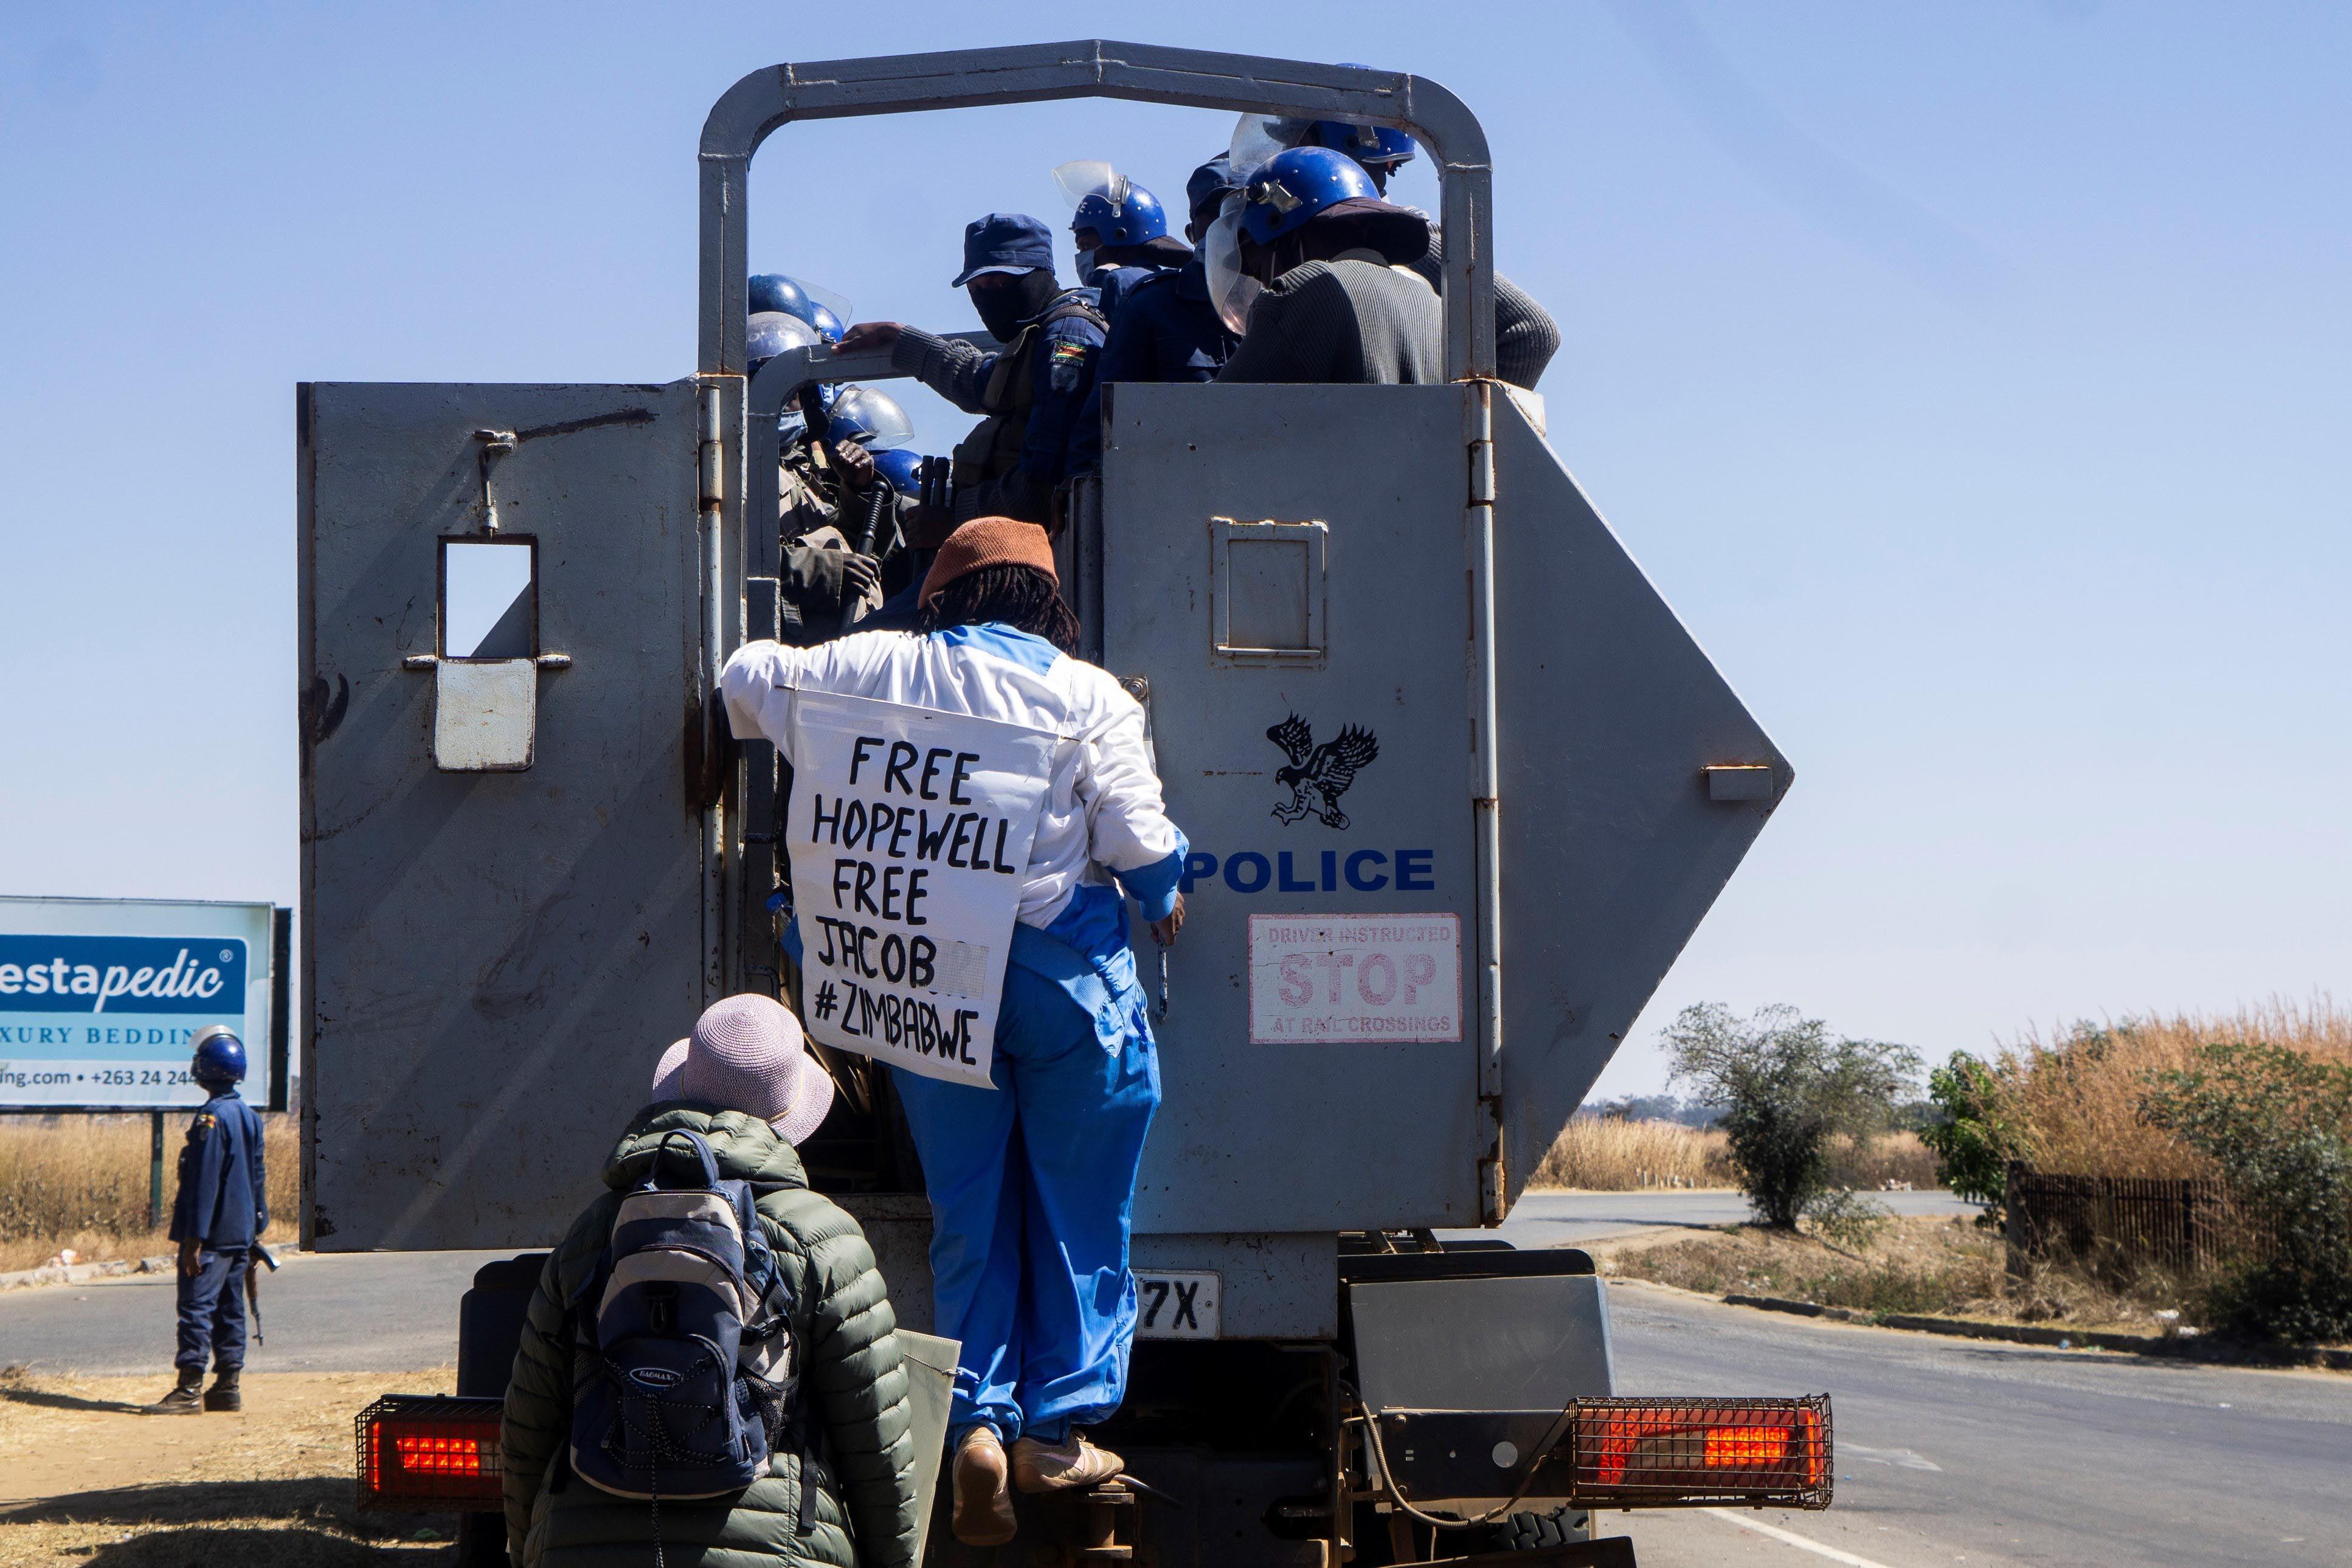 Zimbabwe: SADC, AU Should Denounce Crackdown